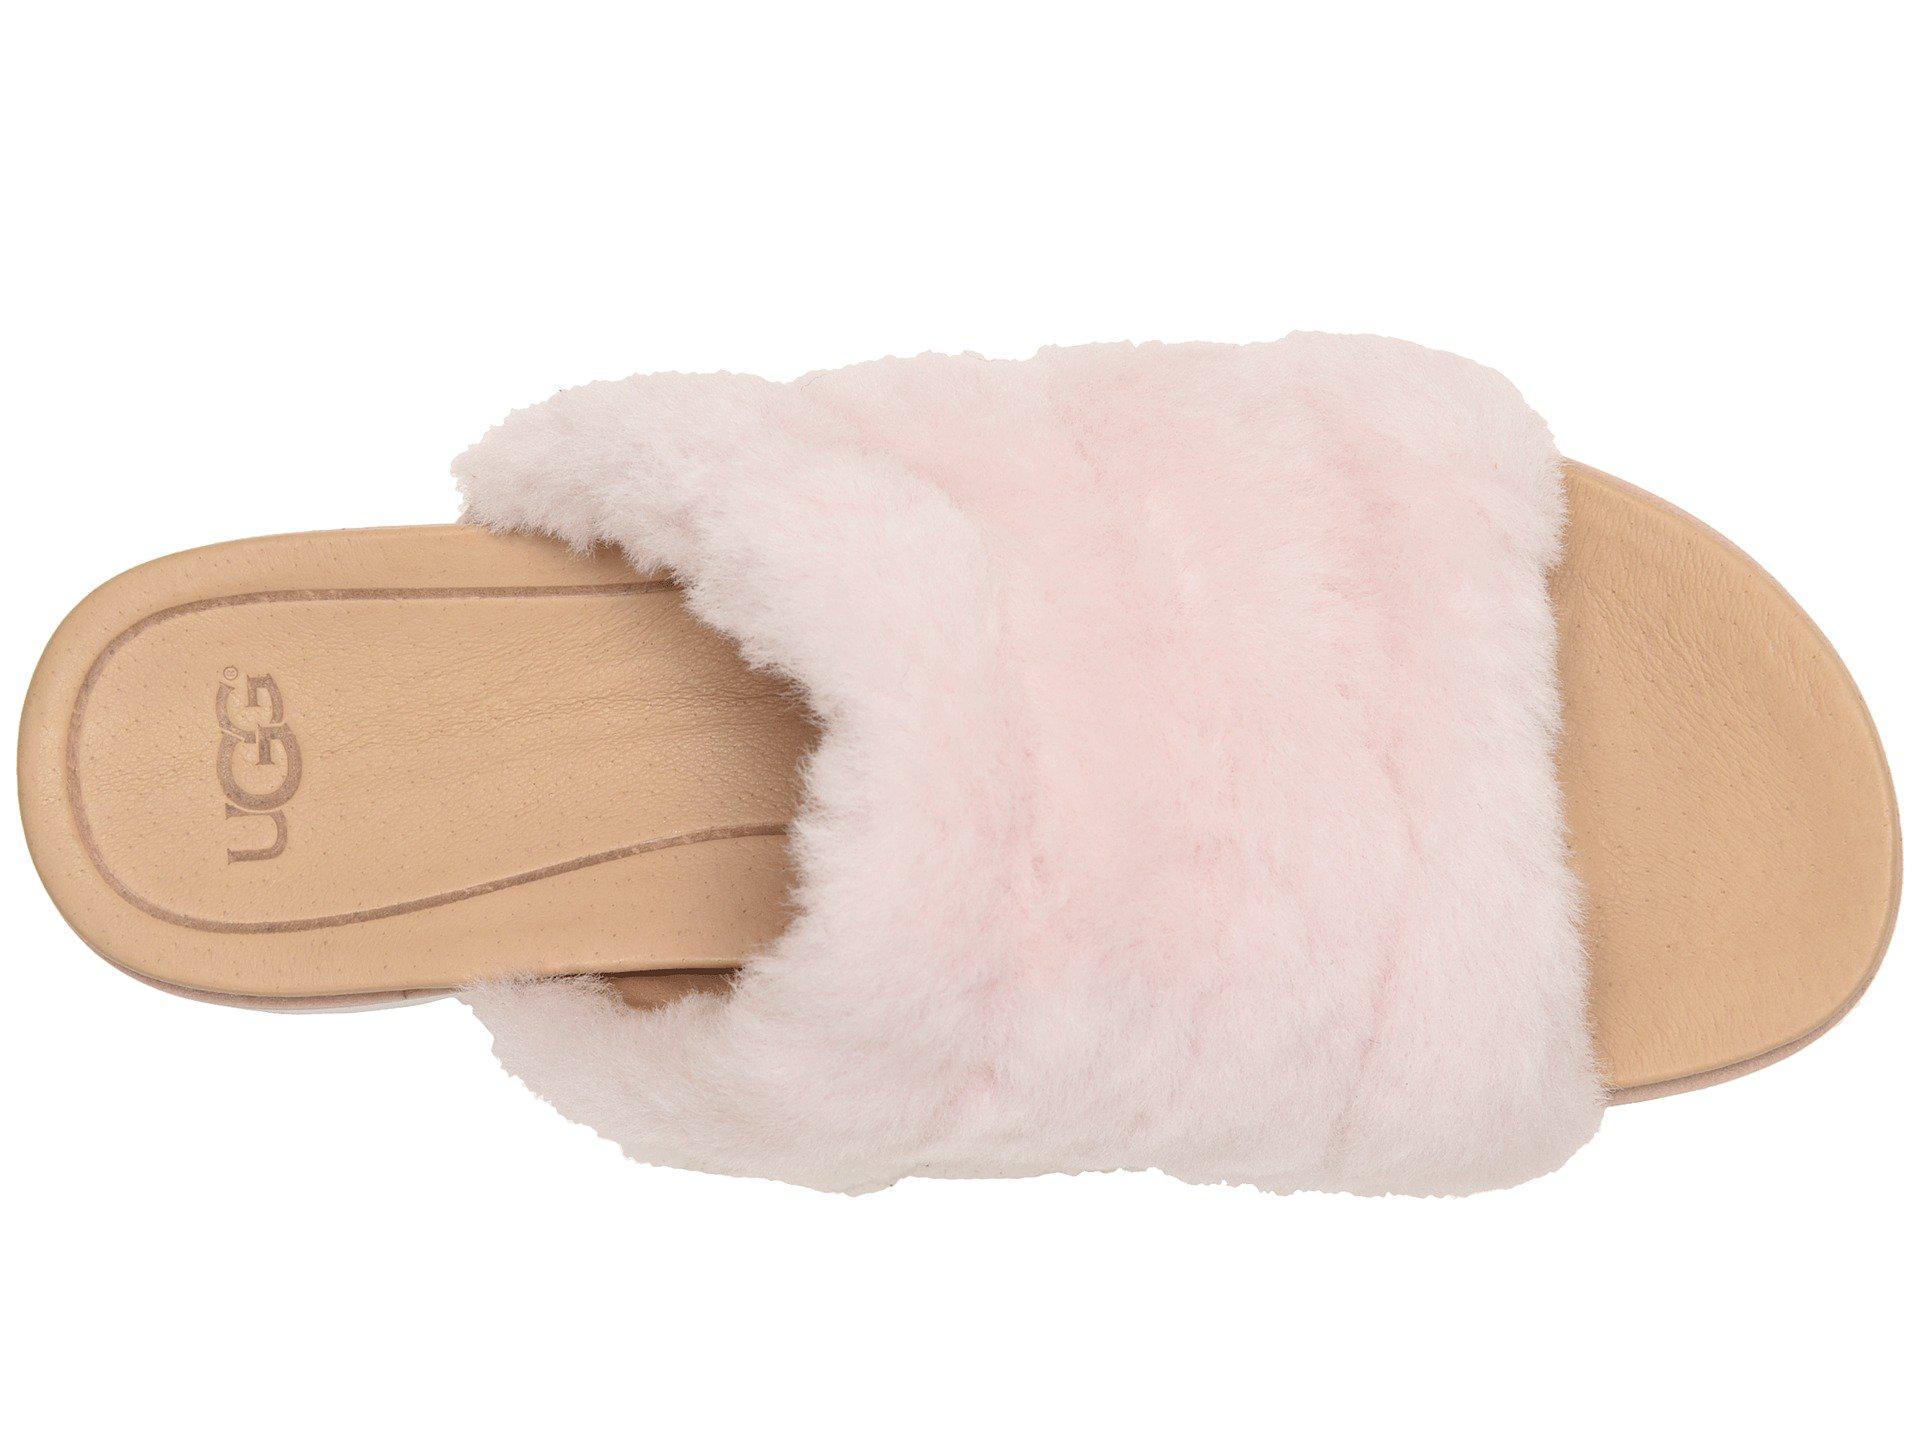 cd5be8c3a6e Ugg - Fluff Yeah Sandal (seashell Pink) Women s Slide Shoes - Lyst. View  fullscreen